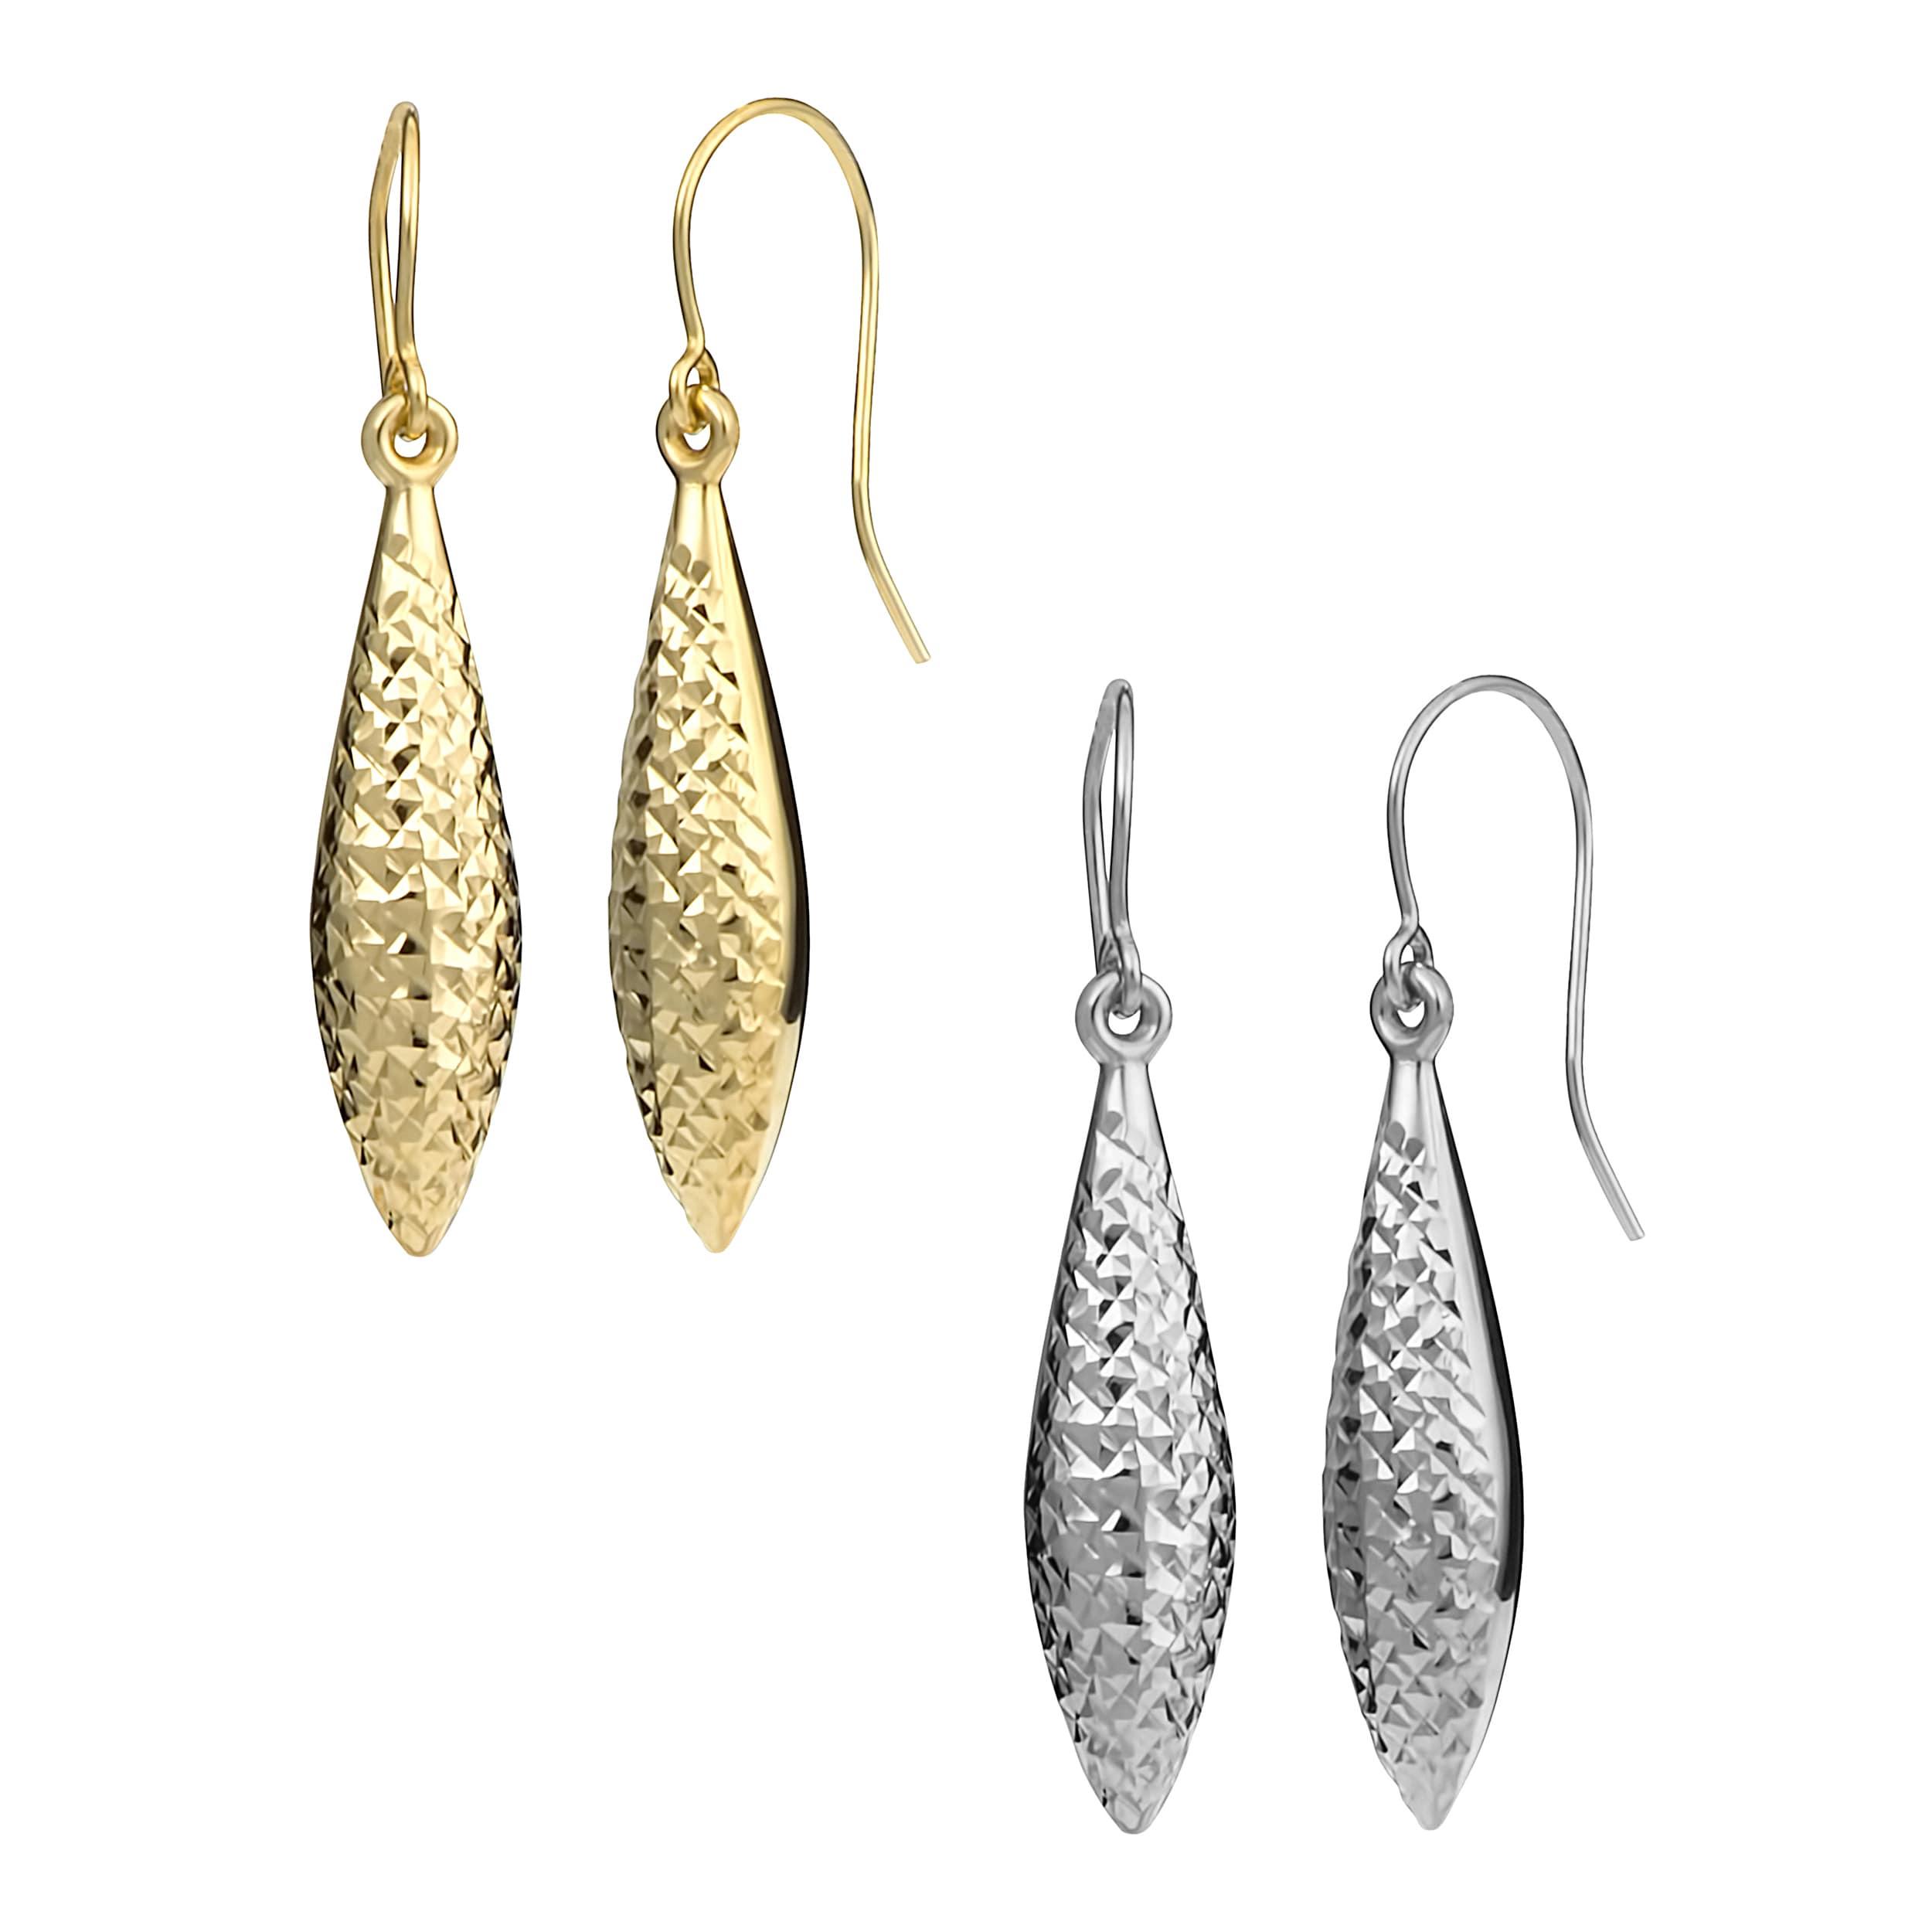 Fremada 10k Gold Diamond-cut Puffed Marquise Dangle Earrings at Sears.com